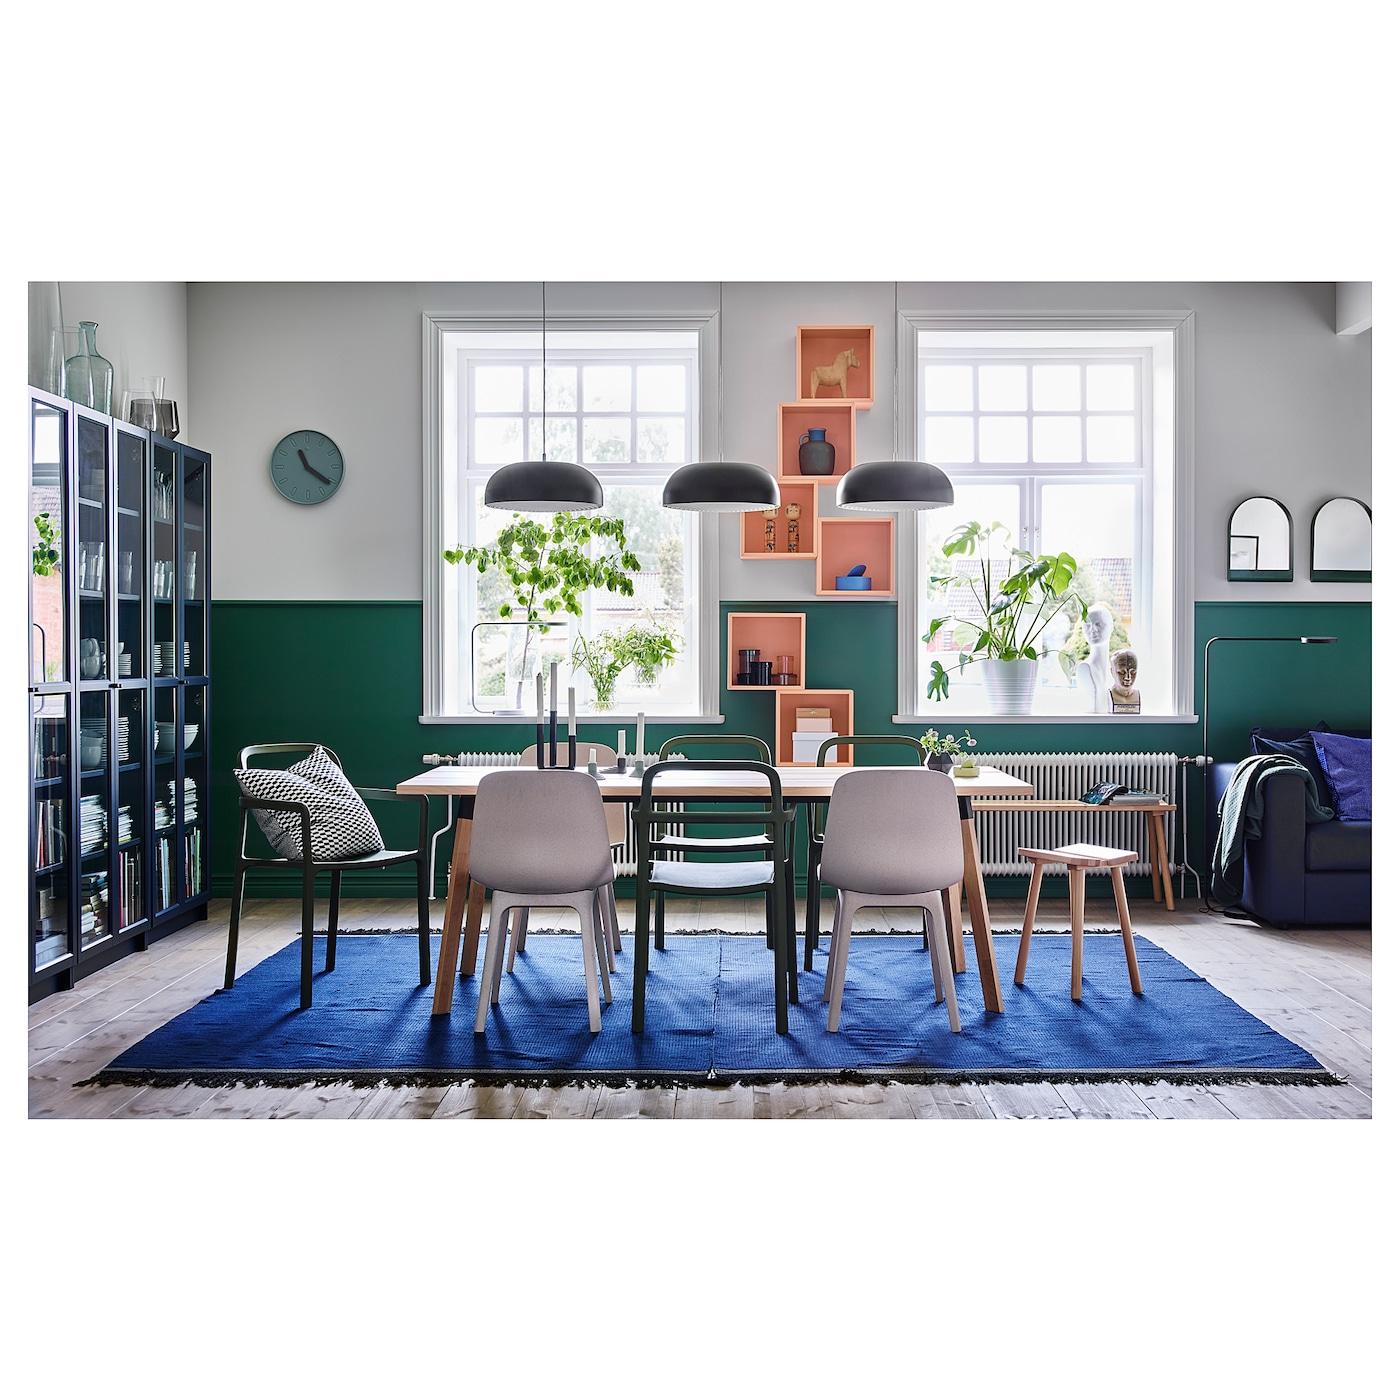 YPPERLIG Chaise à accoudoirs, intextérieur vert